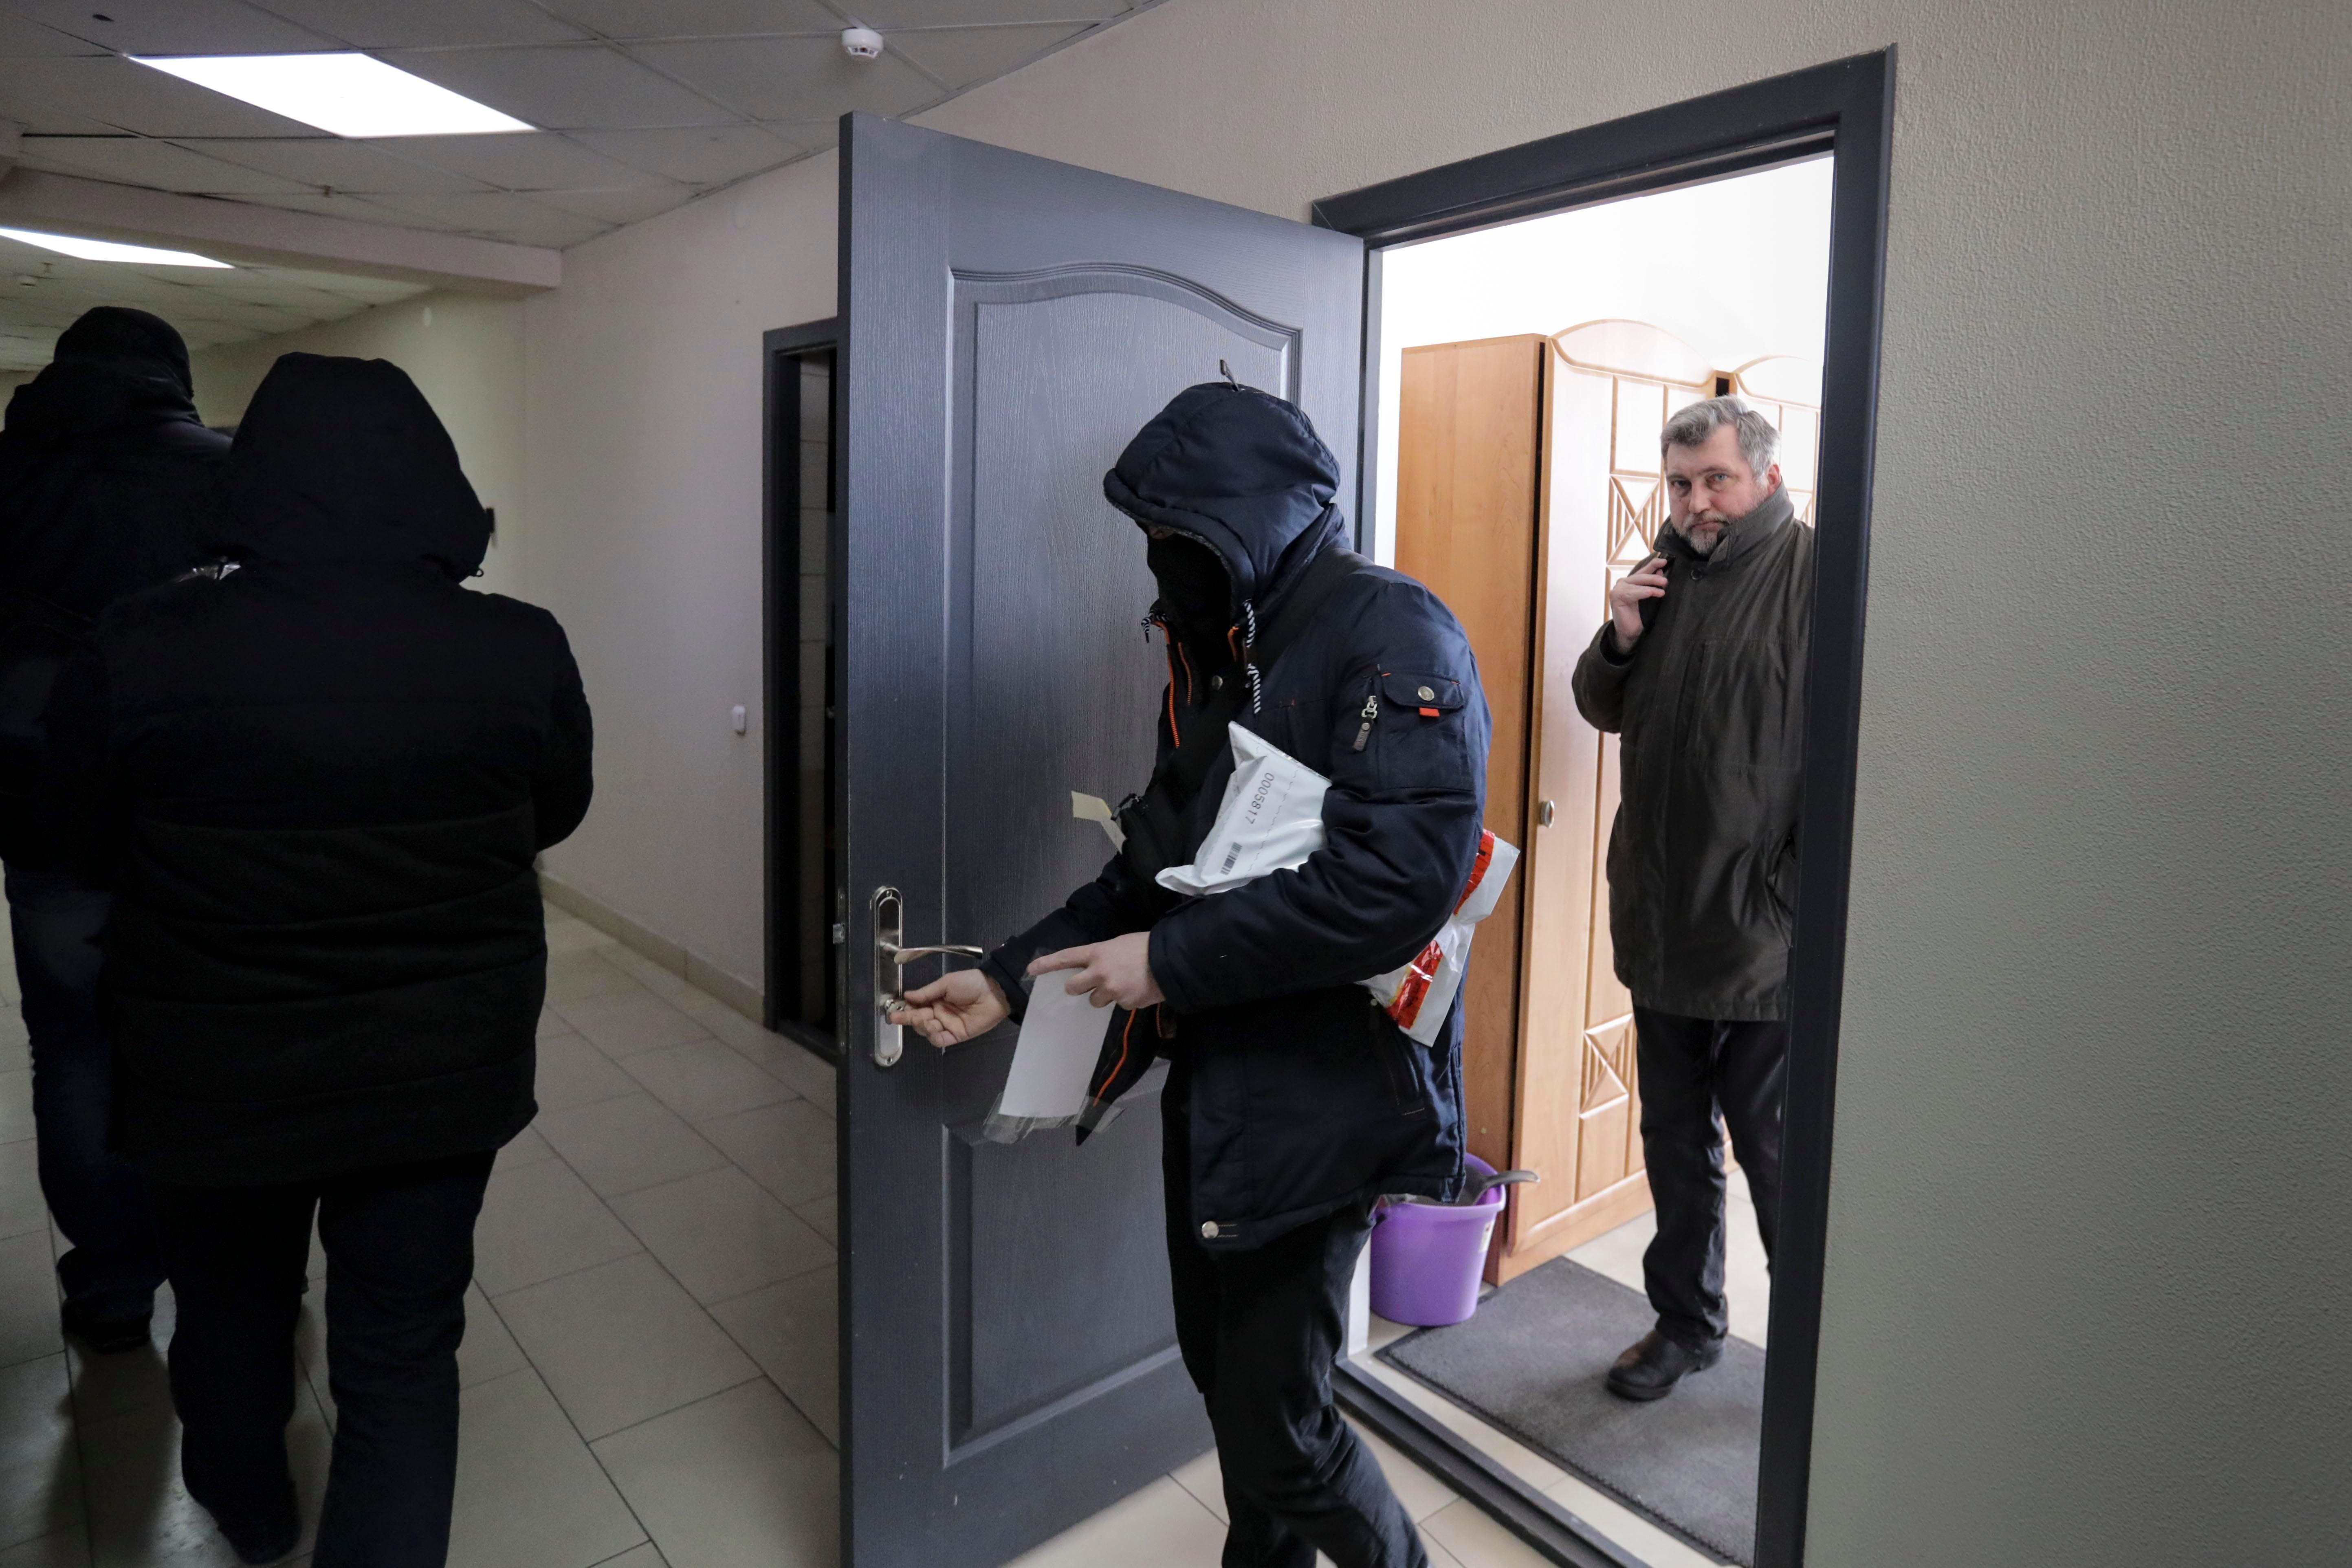 Belarus: Crackdown Escalates